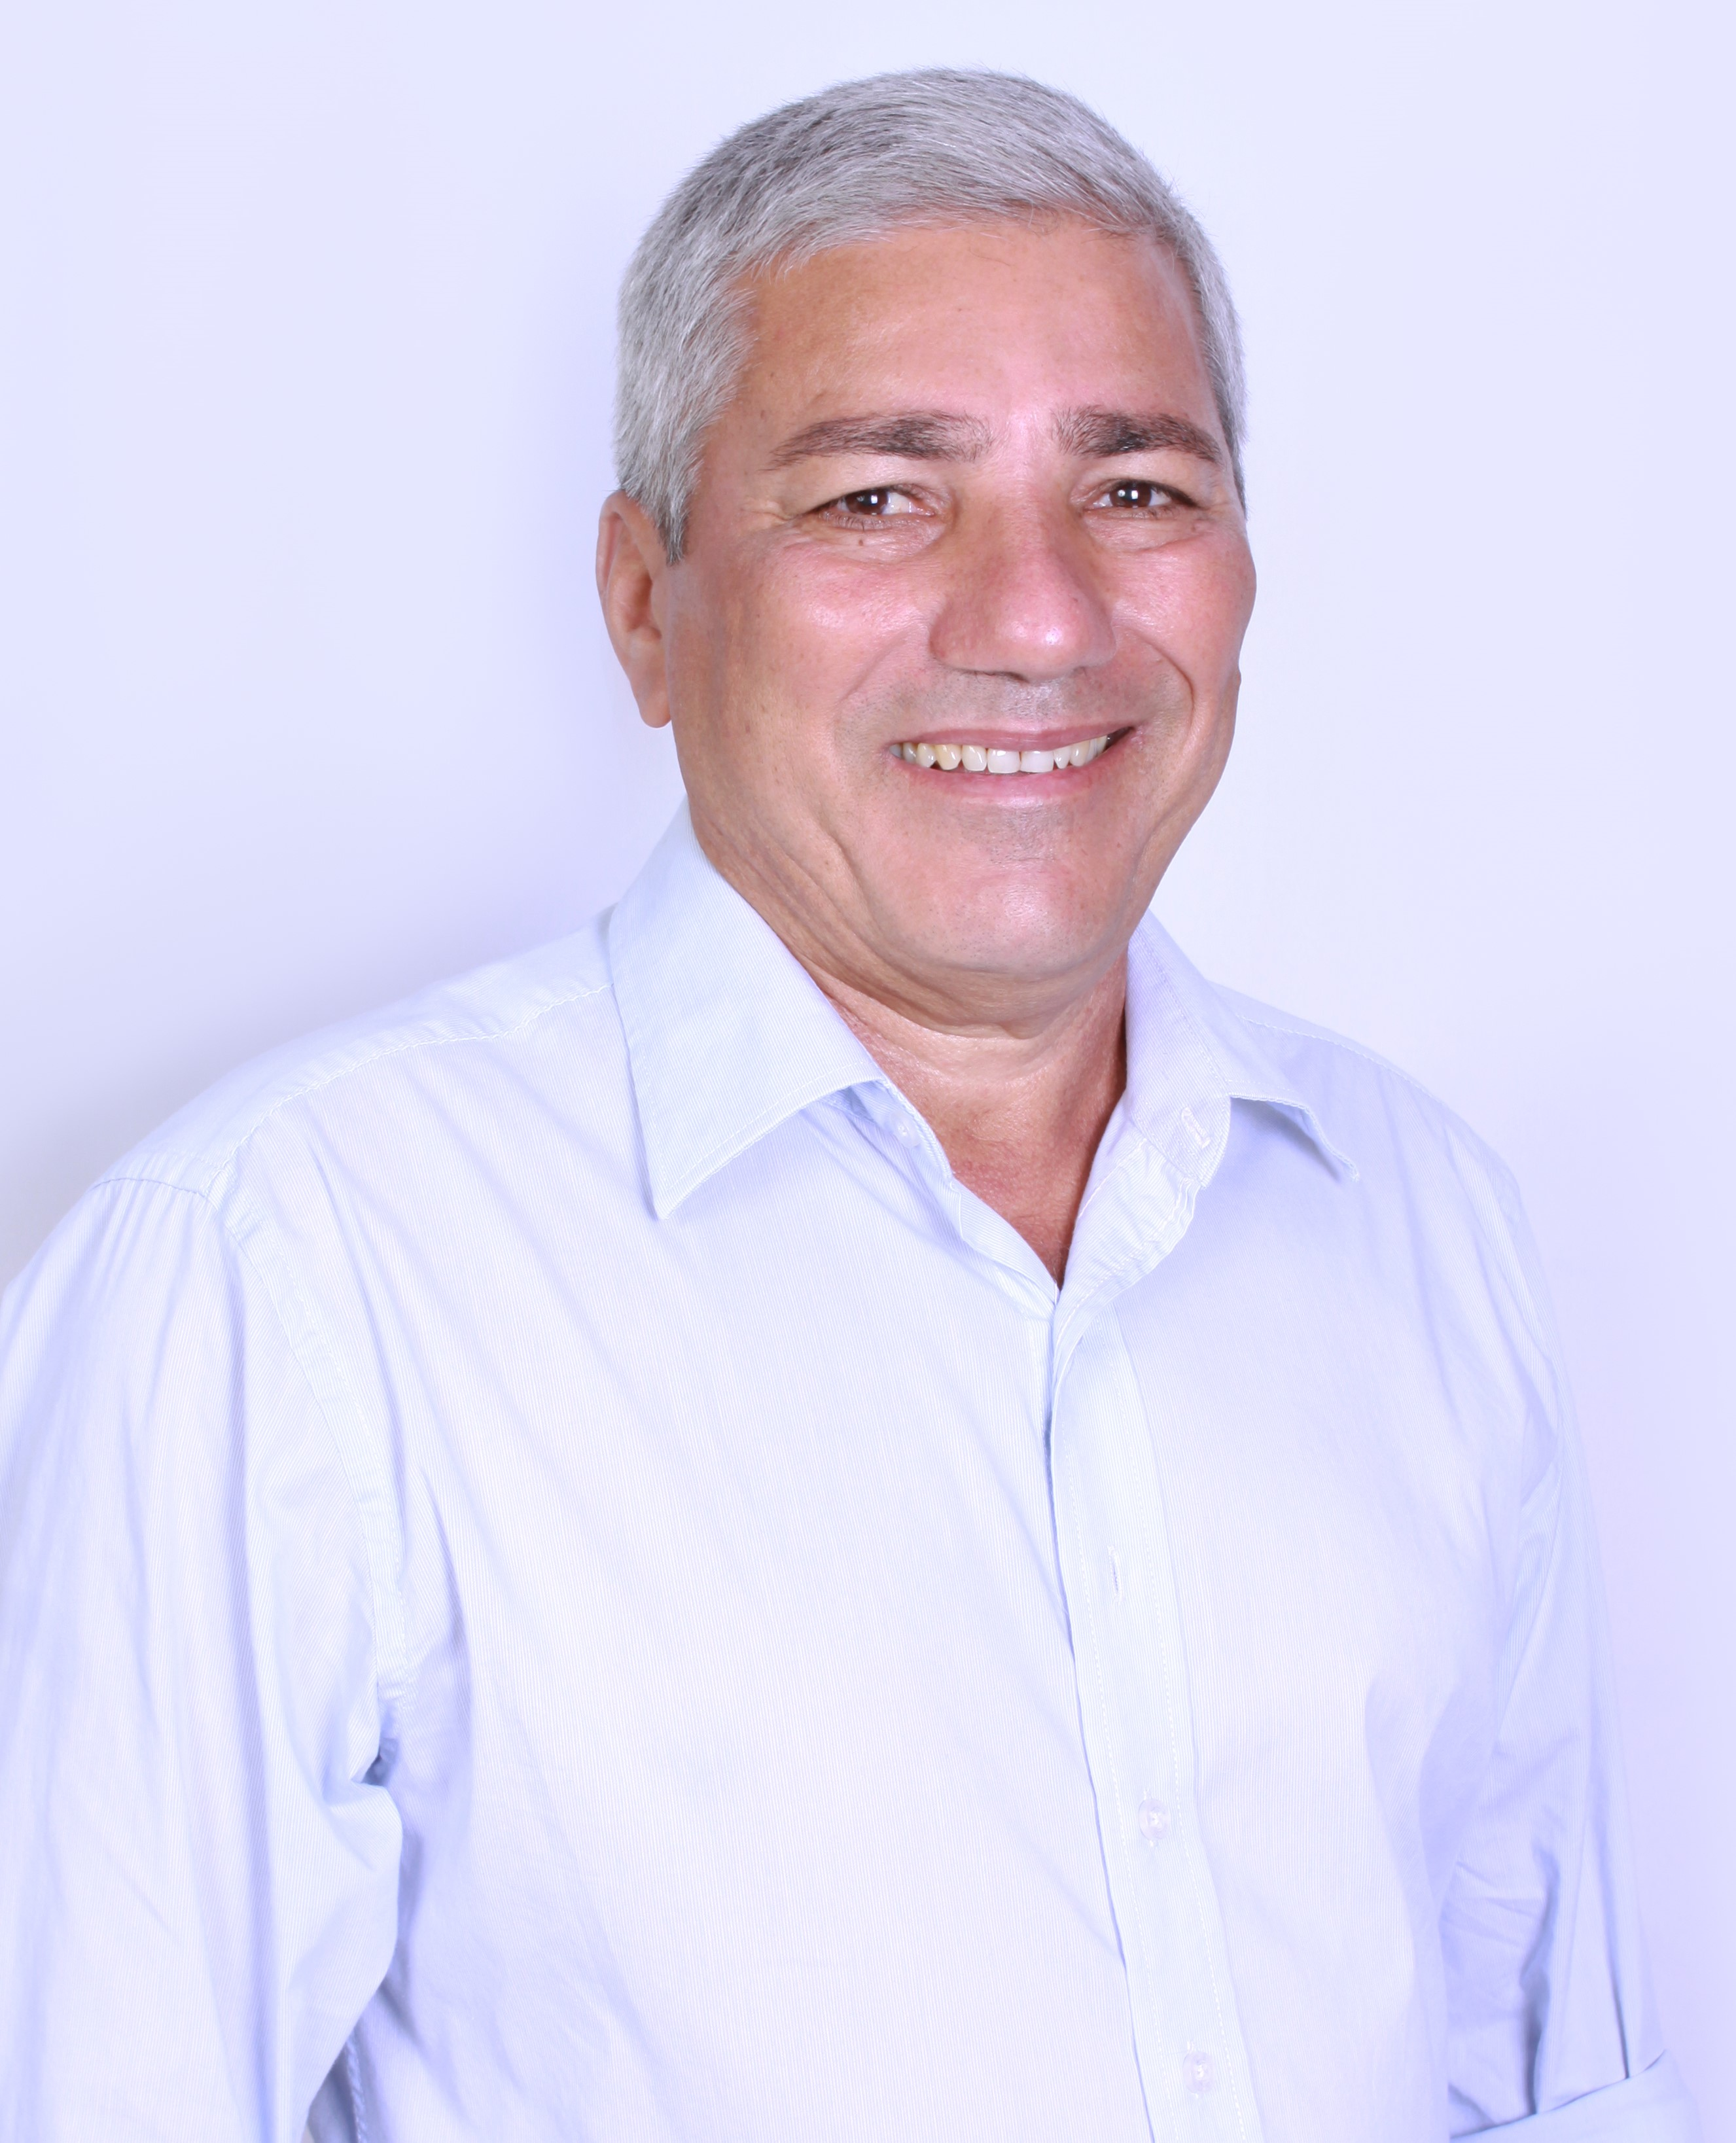 Ulisses Souza Filho